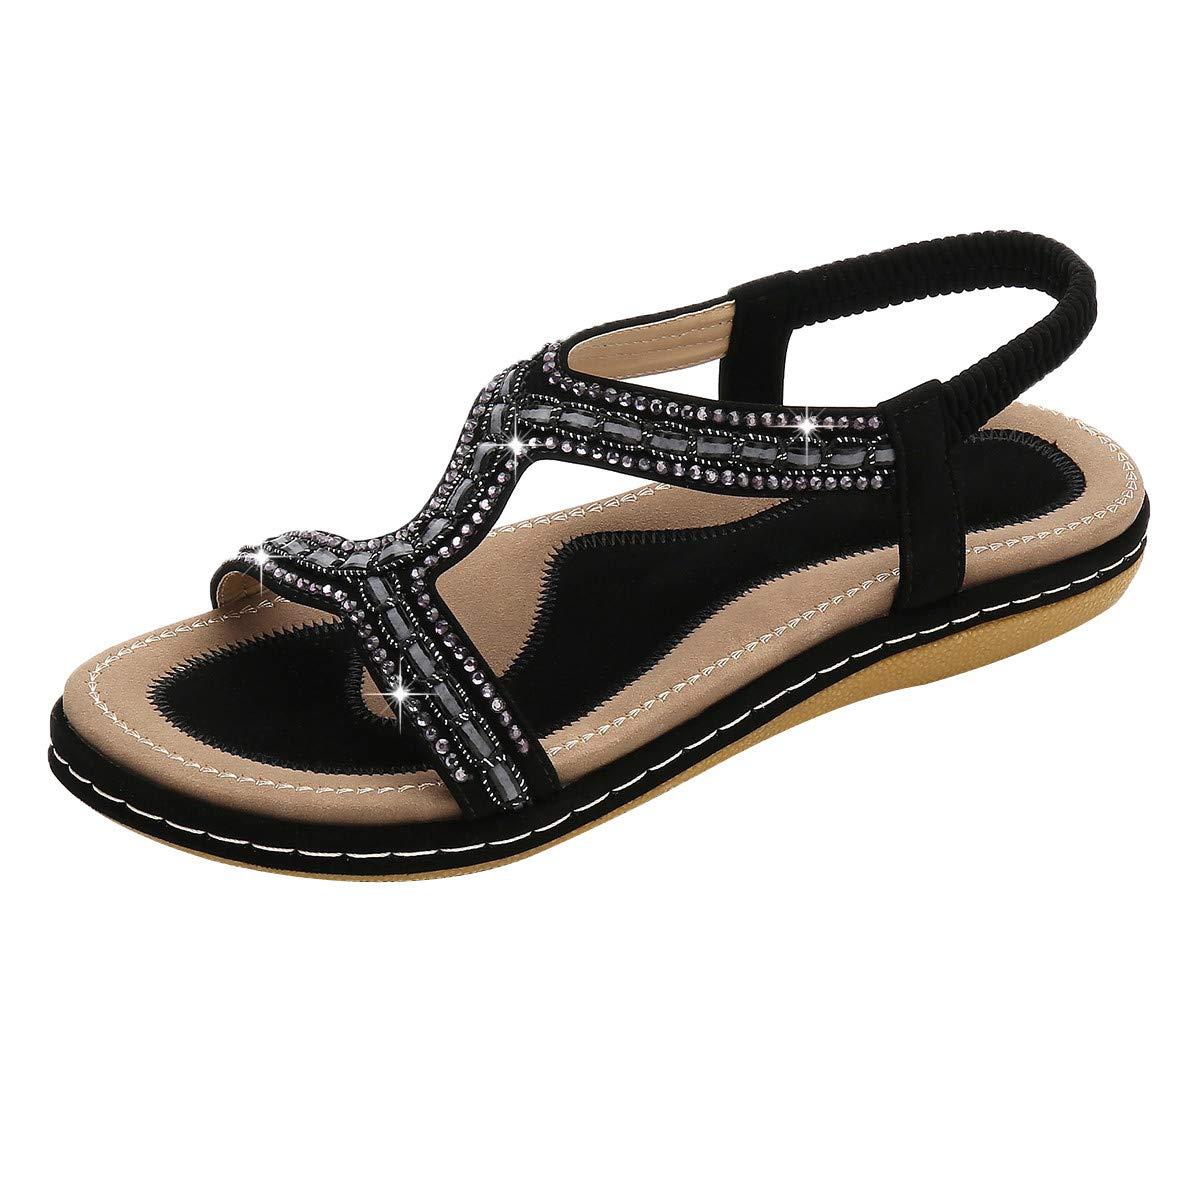 Summer Women's Flat Shoes Bohemian Sandals Open Toe Elastic Band Beach Sandals